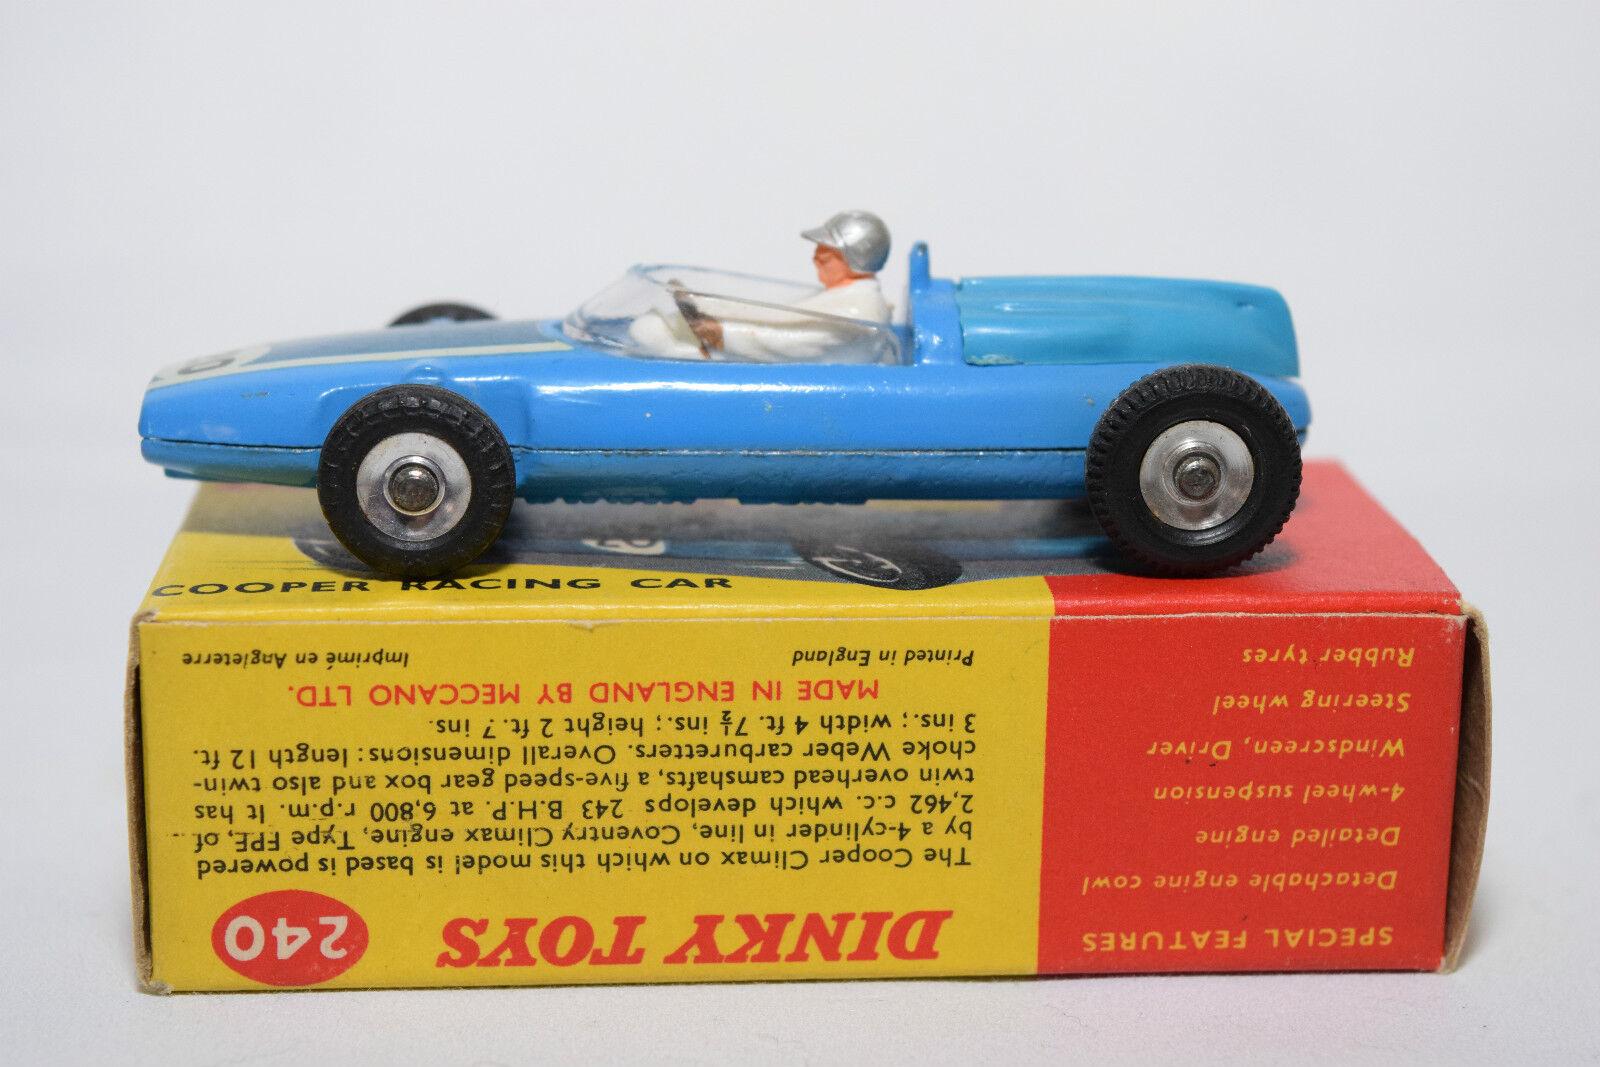 P DINKY TOYS 240 240 240 COOPER RACING CAR GREY HELMET MINT BOXED RARE SELTEN RARO a8668a